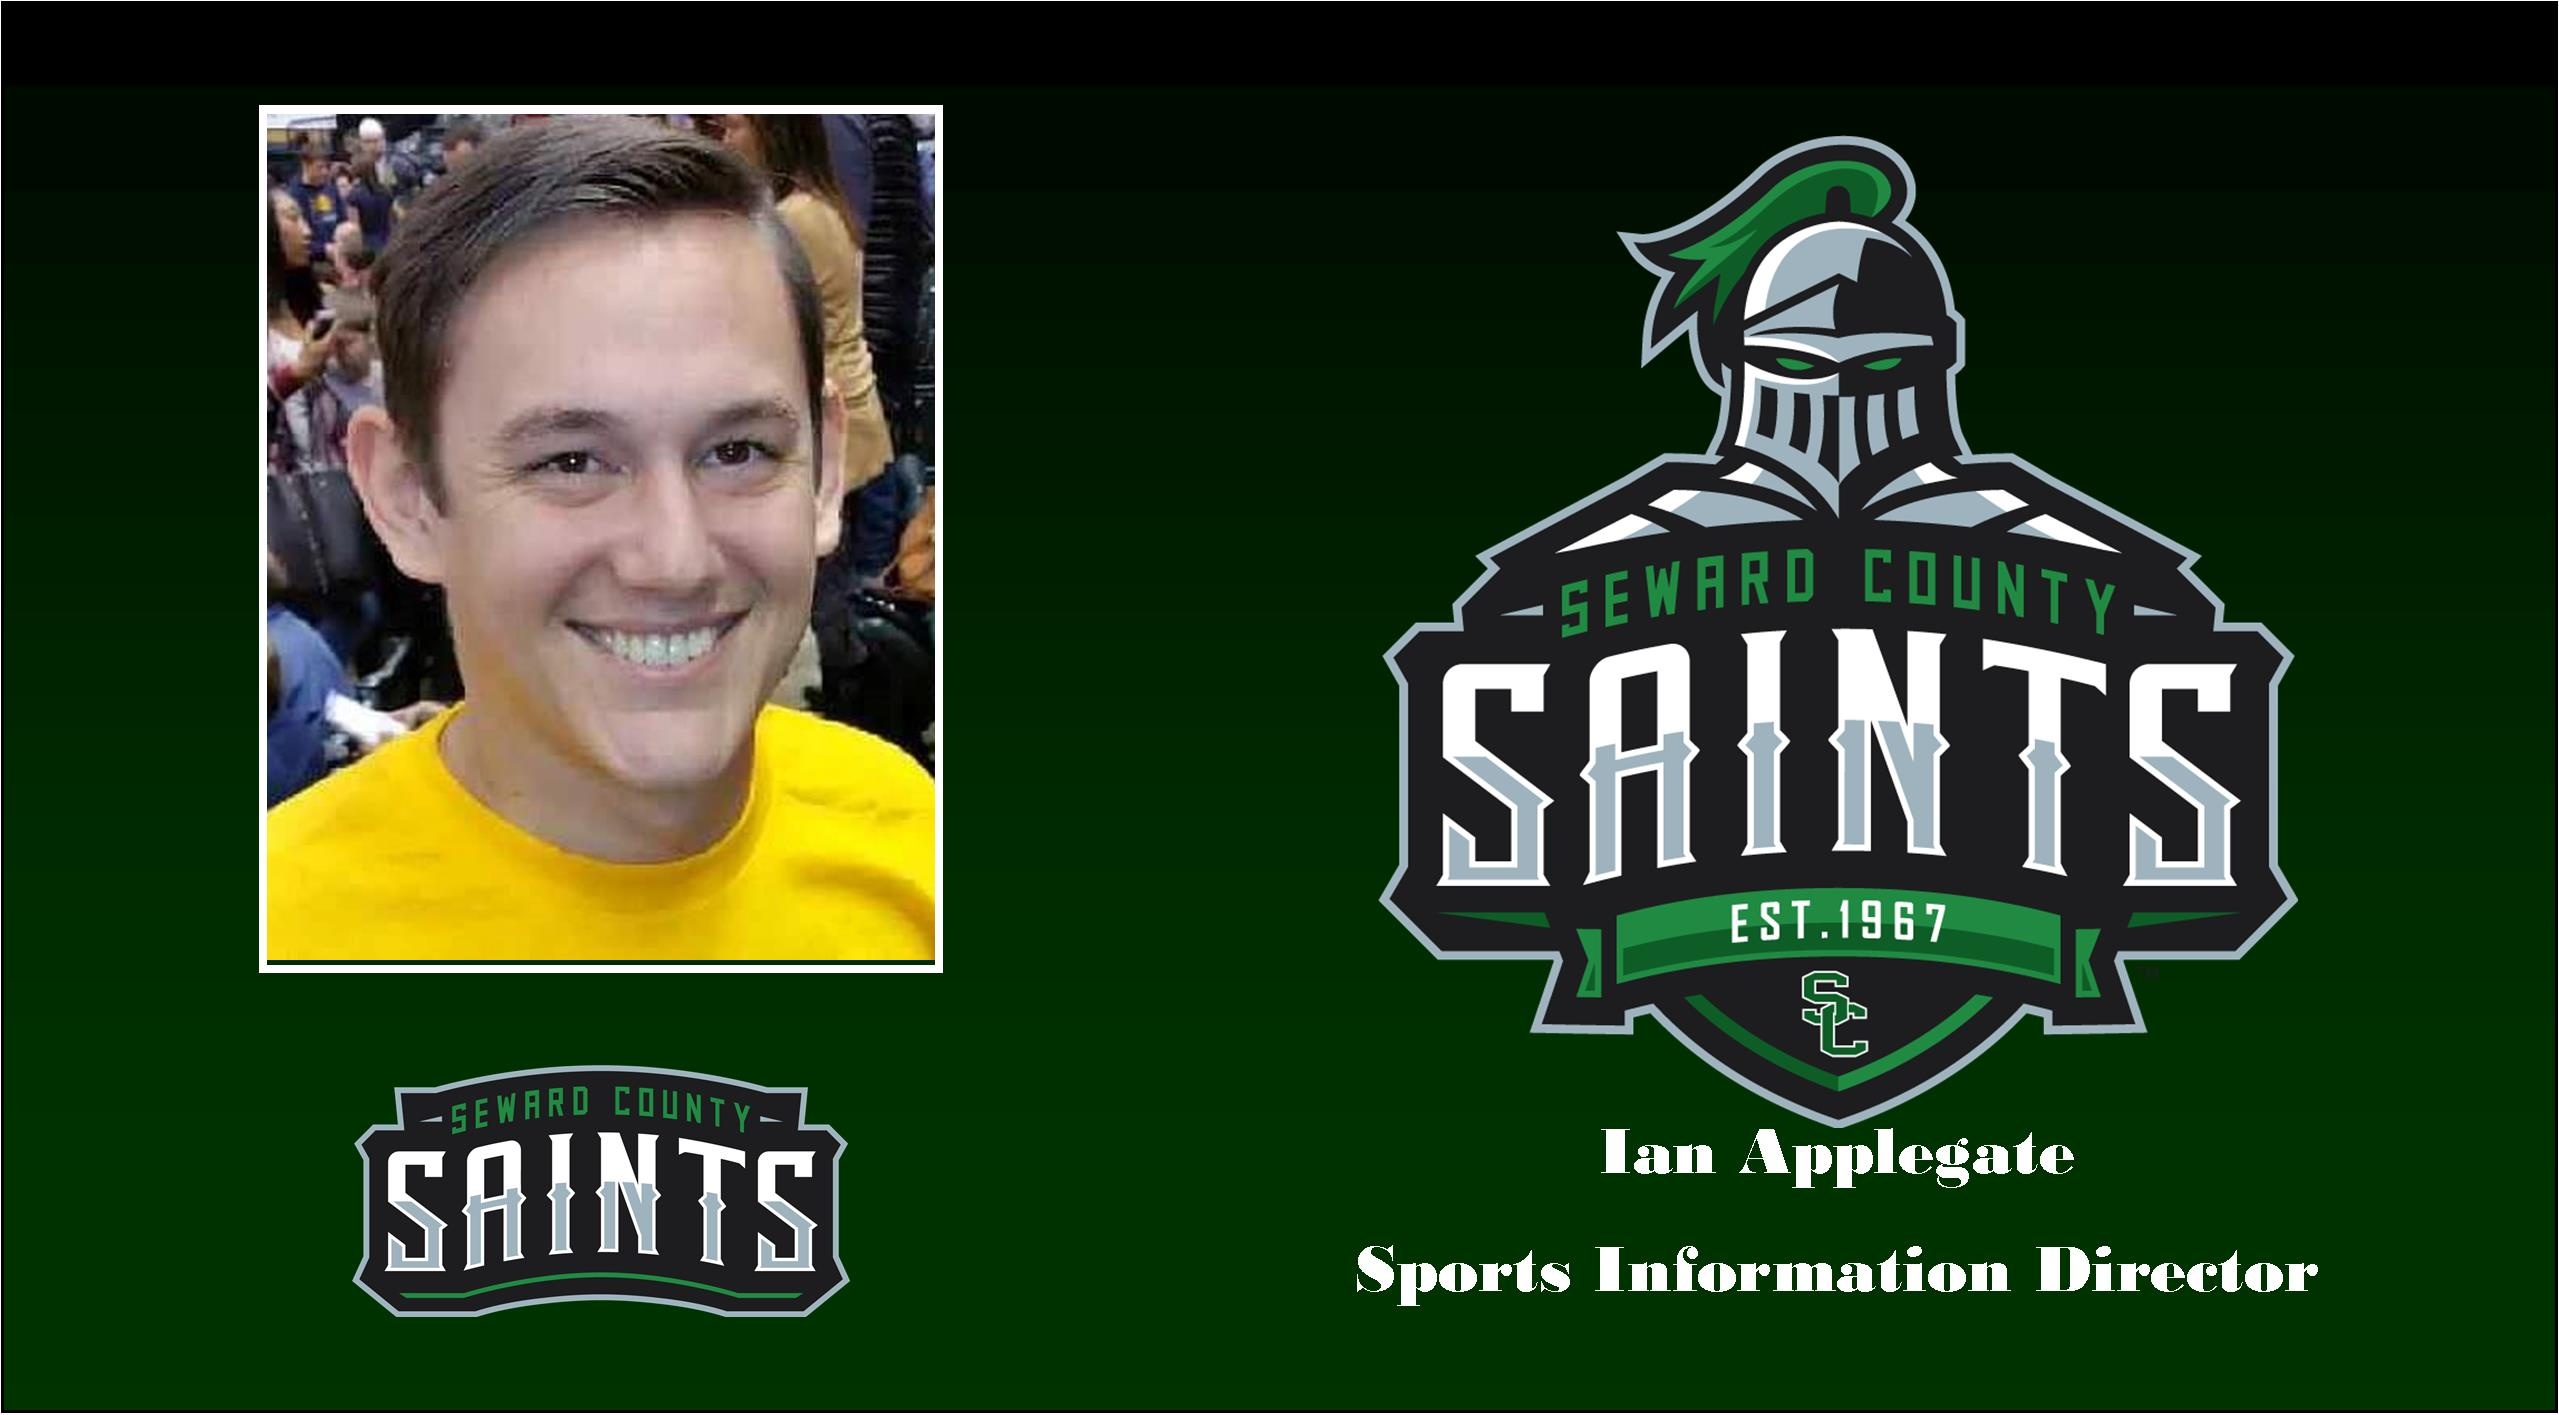 Saints Tab Applegate For Sports Information Director